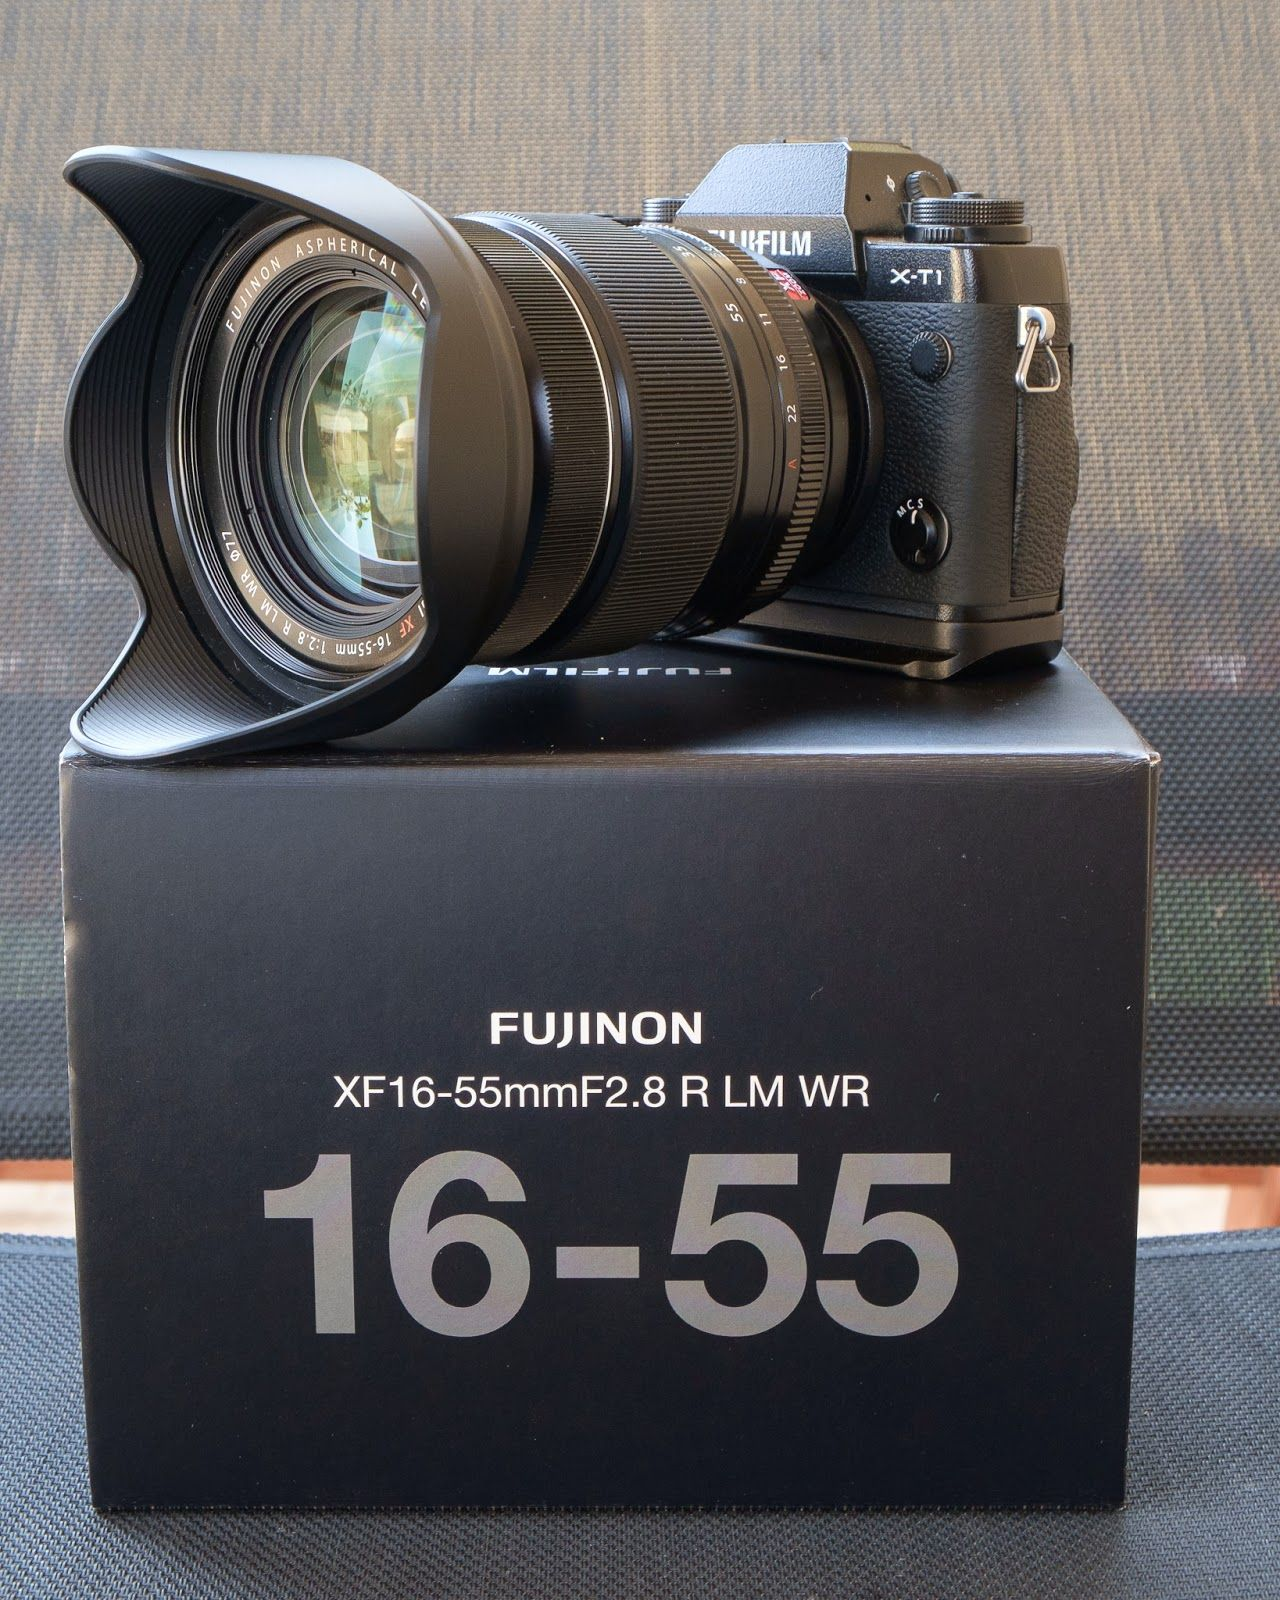 Bjorn Moerman Fotografia Primeiro Olhar Para Fujifilm Xf 16 55 F 2 8 R Lens Lm Wr Fujinon Fujifilm Digital Camera Fujifilm Camera Fujifilm